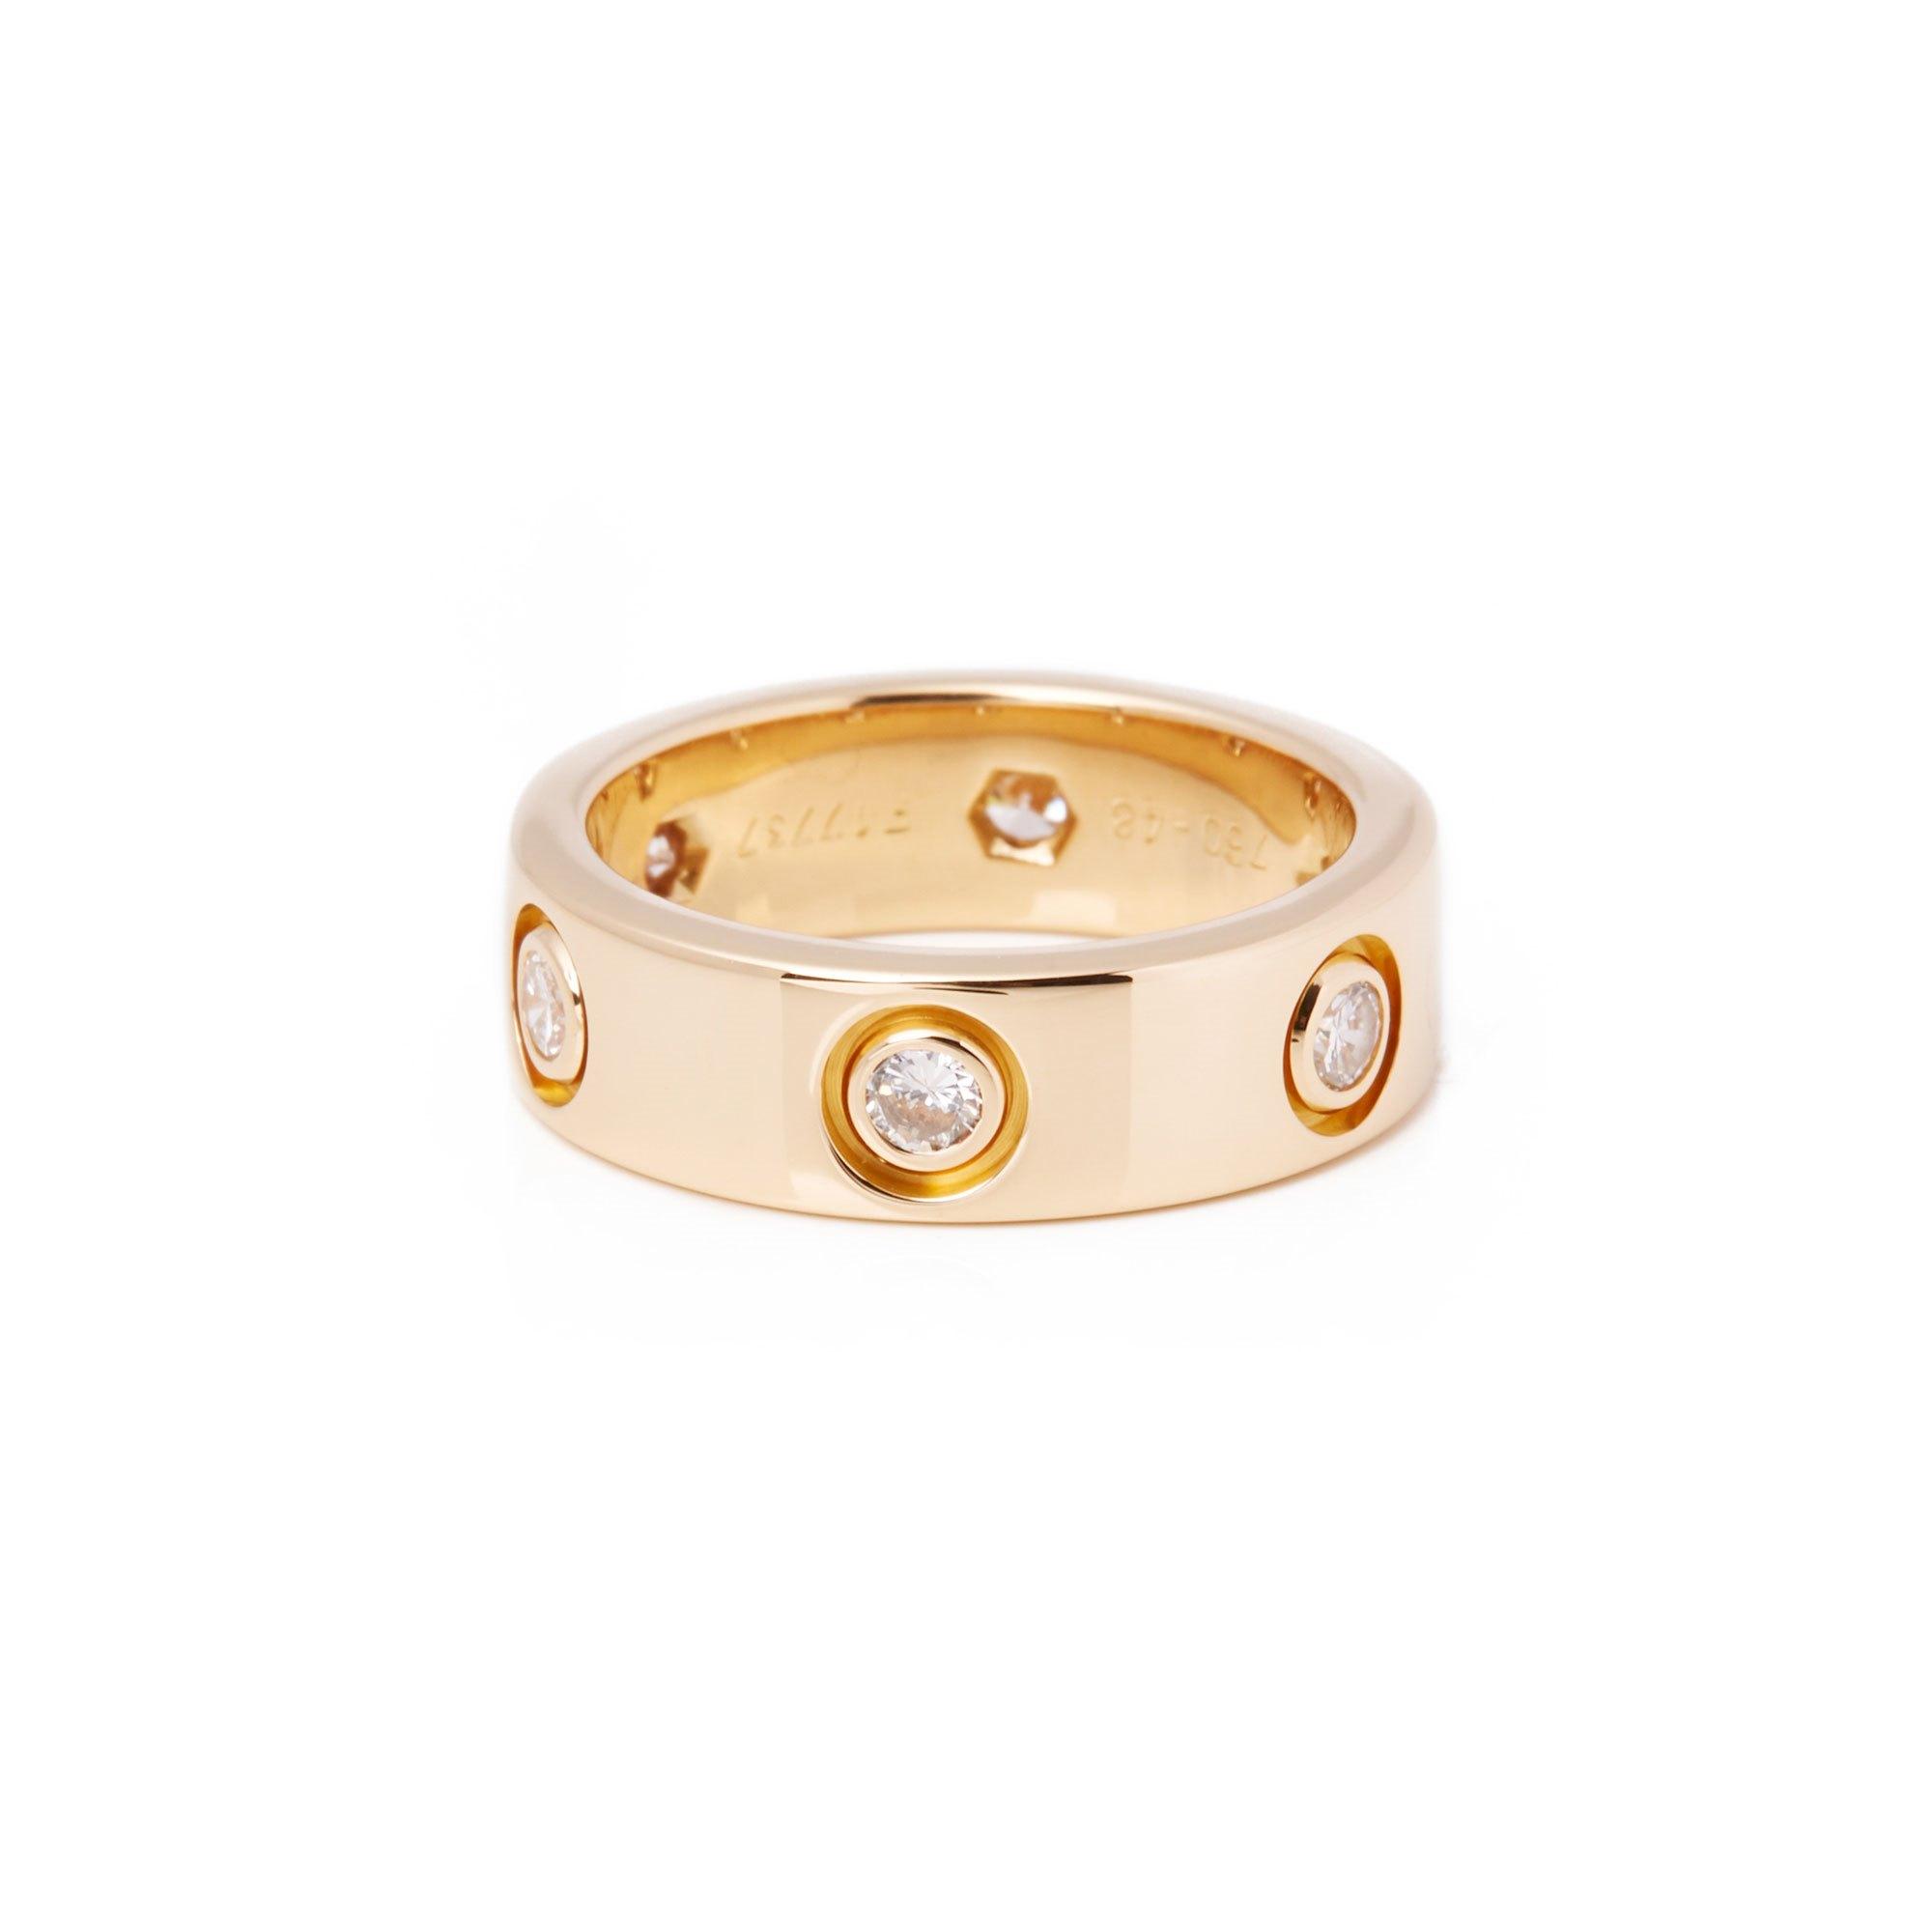 Cartier Love 18ct Yellow Gold Full Diamond Band Ring